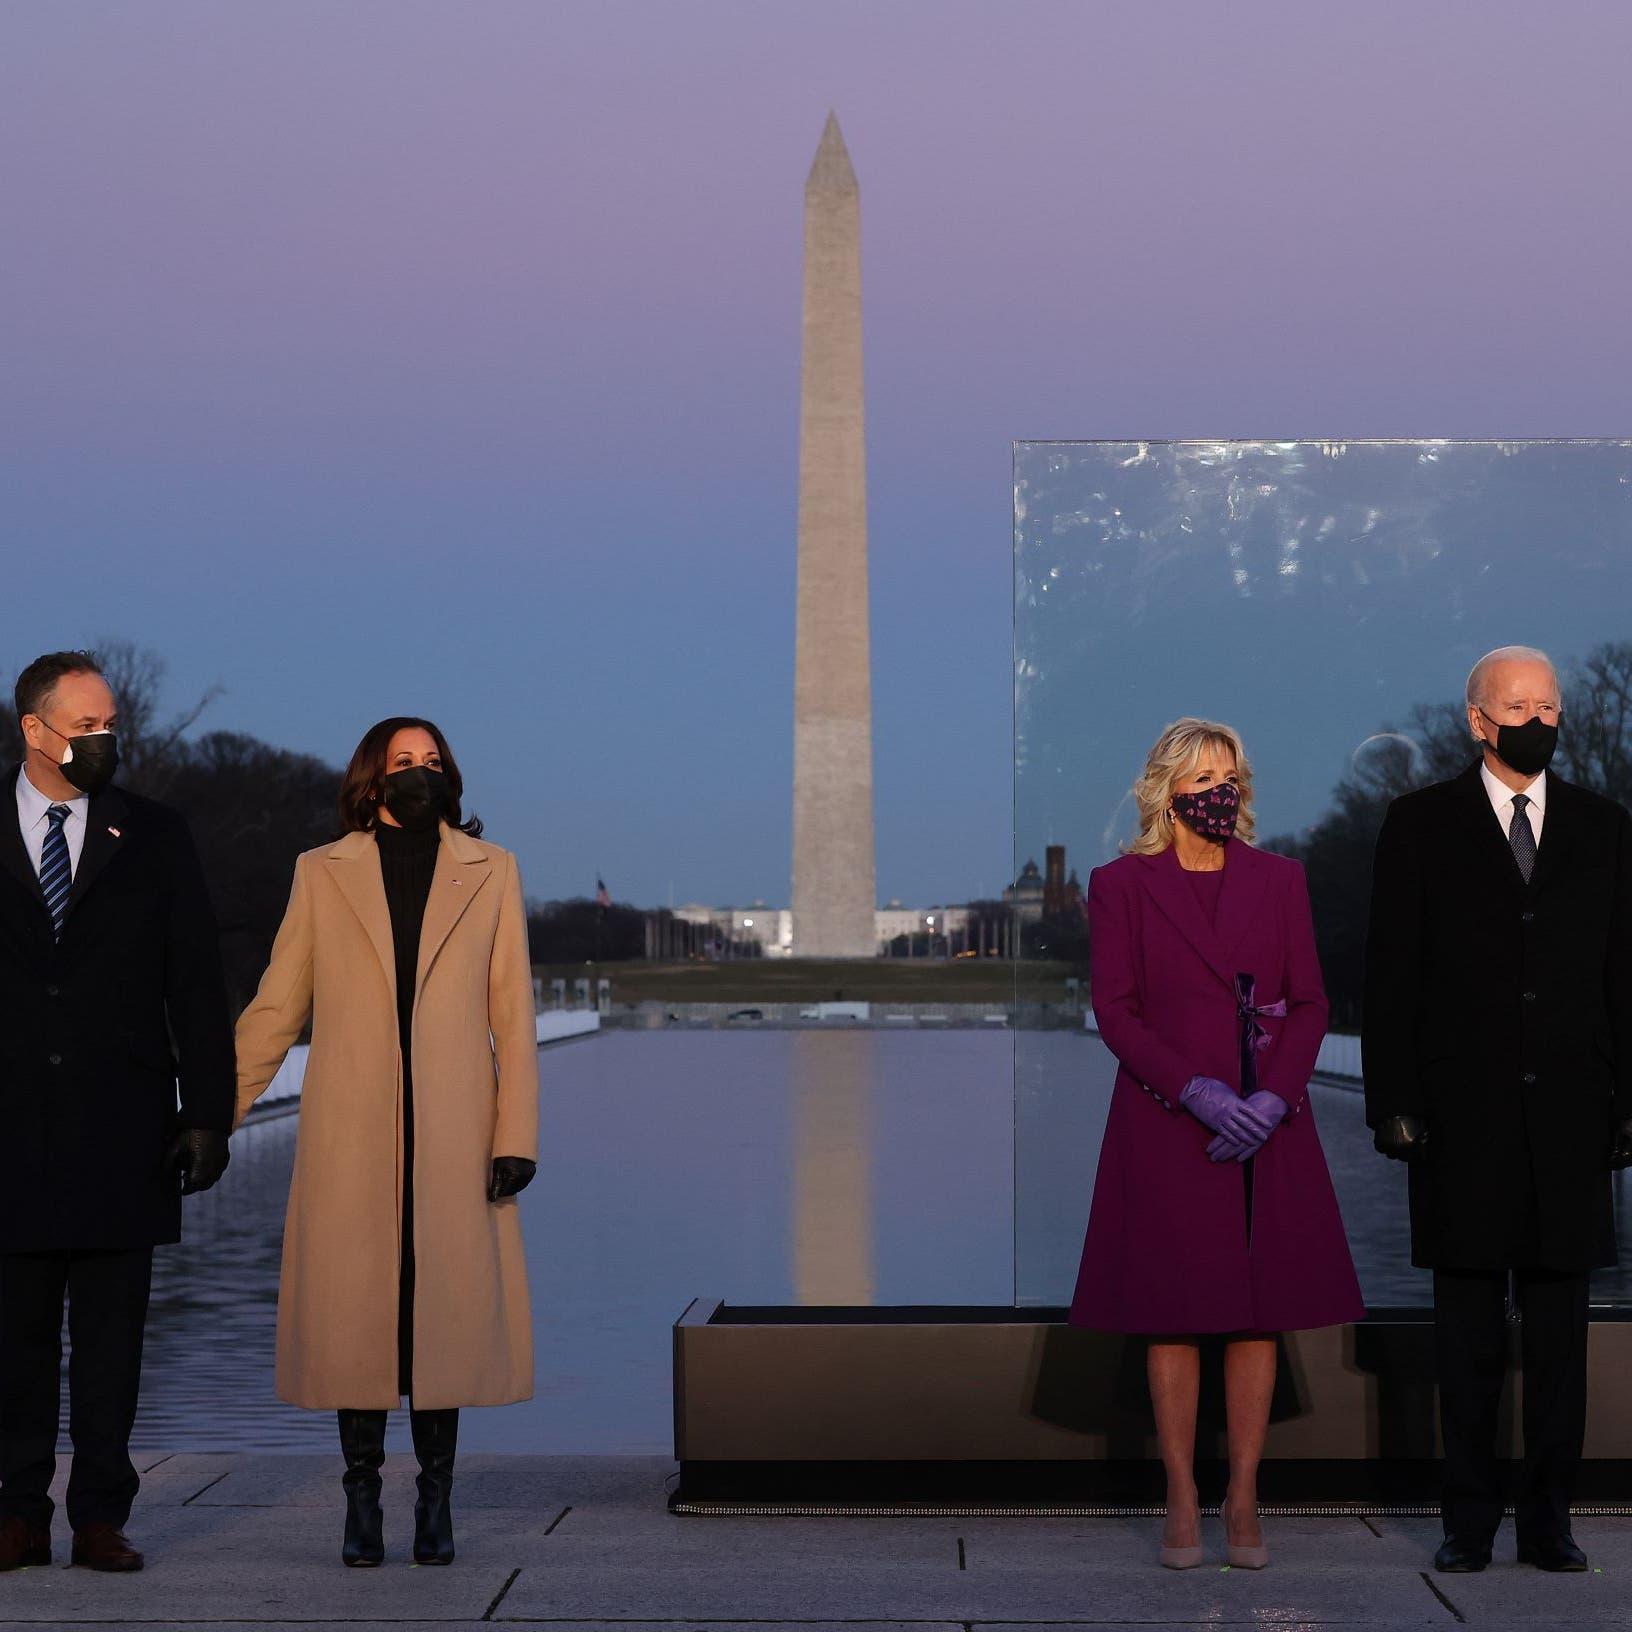 فور وصوله واشنطن.. بايدن يحيي ذكرى ضحايا كورونا الـ400 ألف